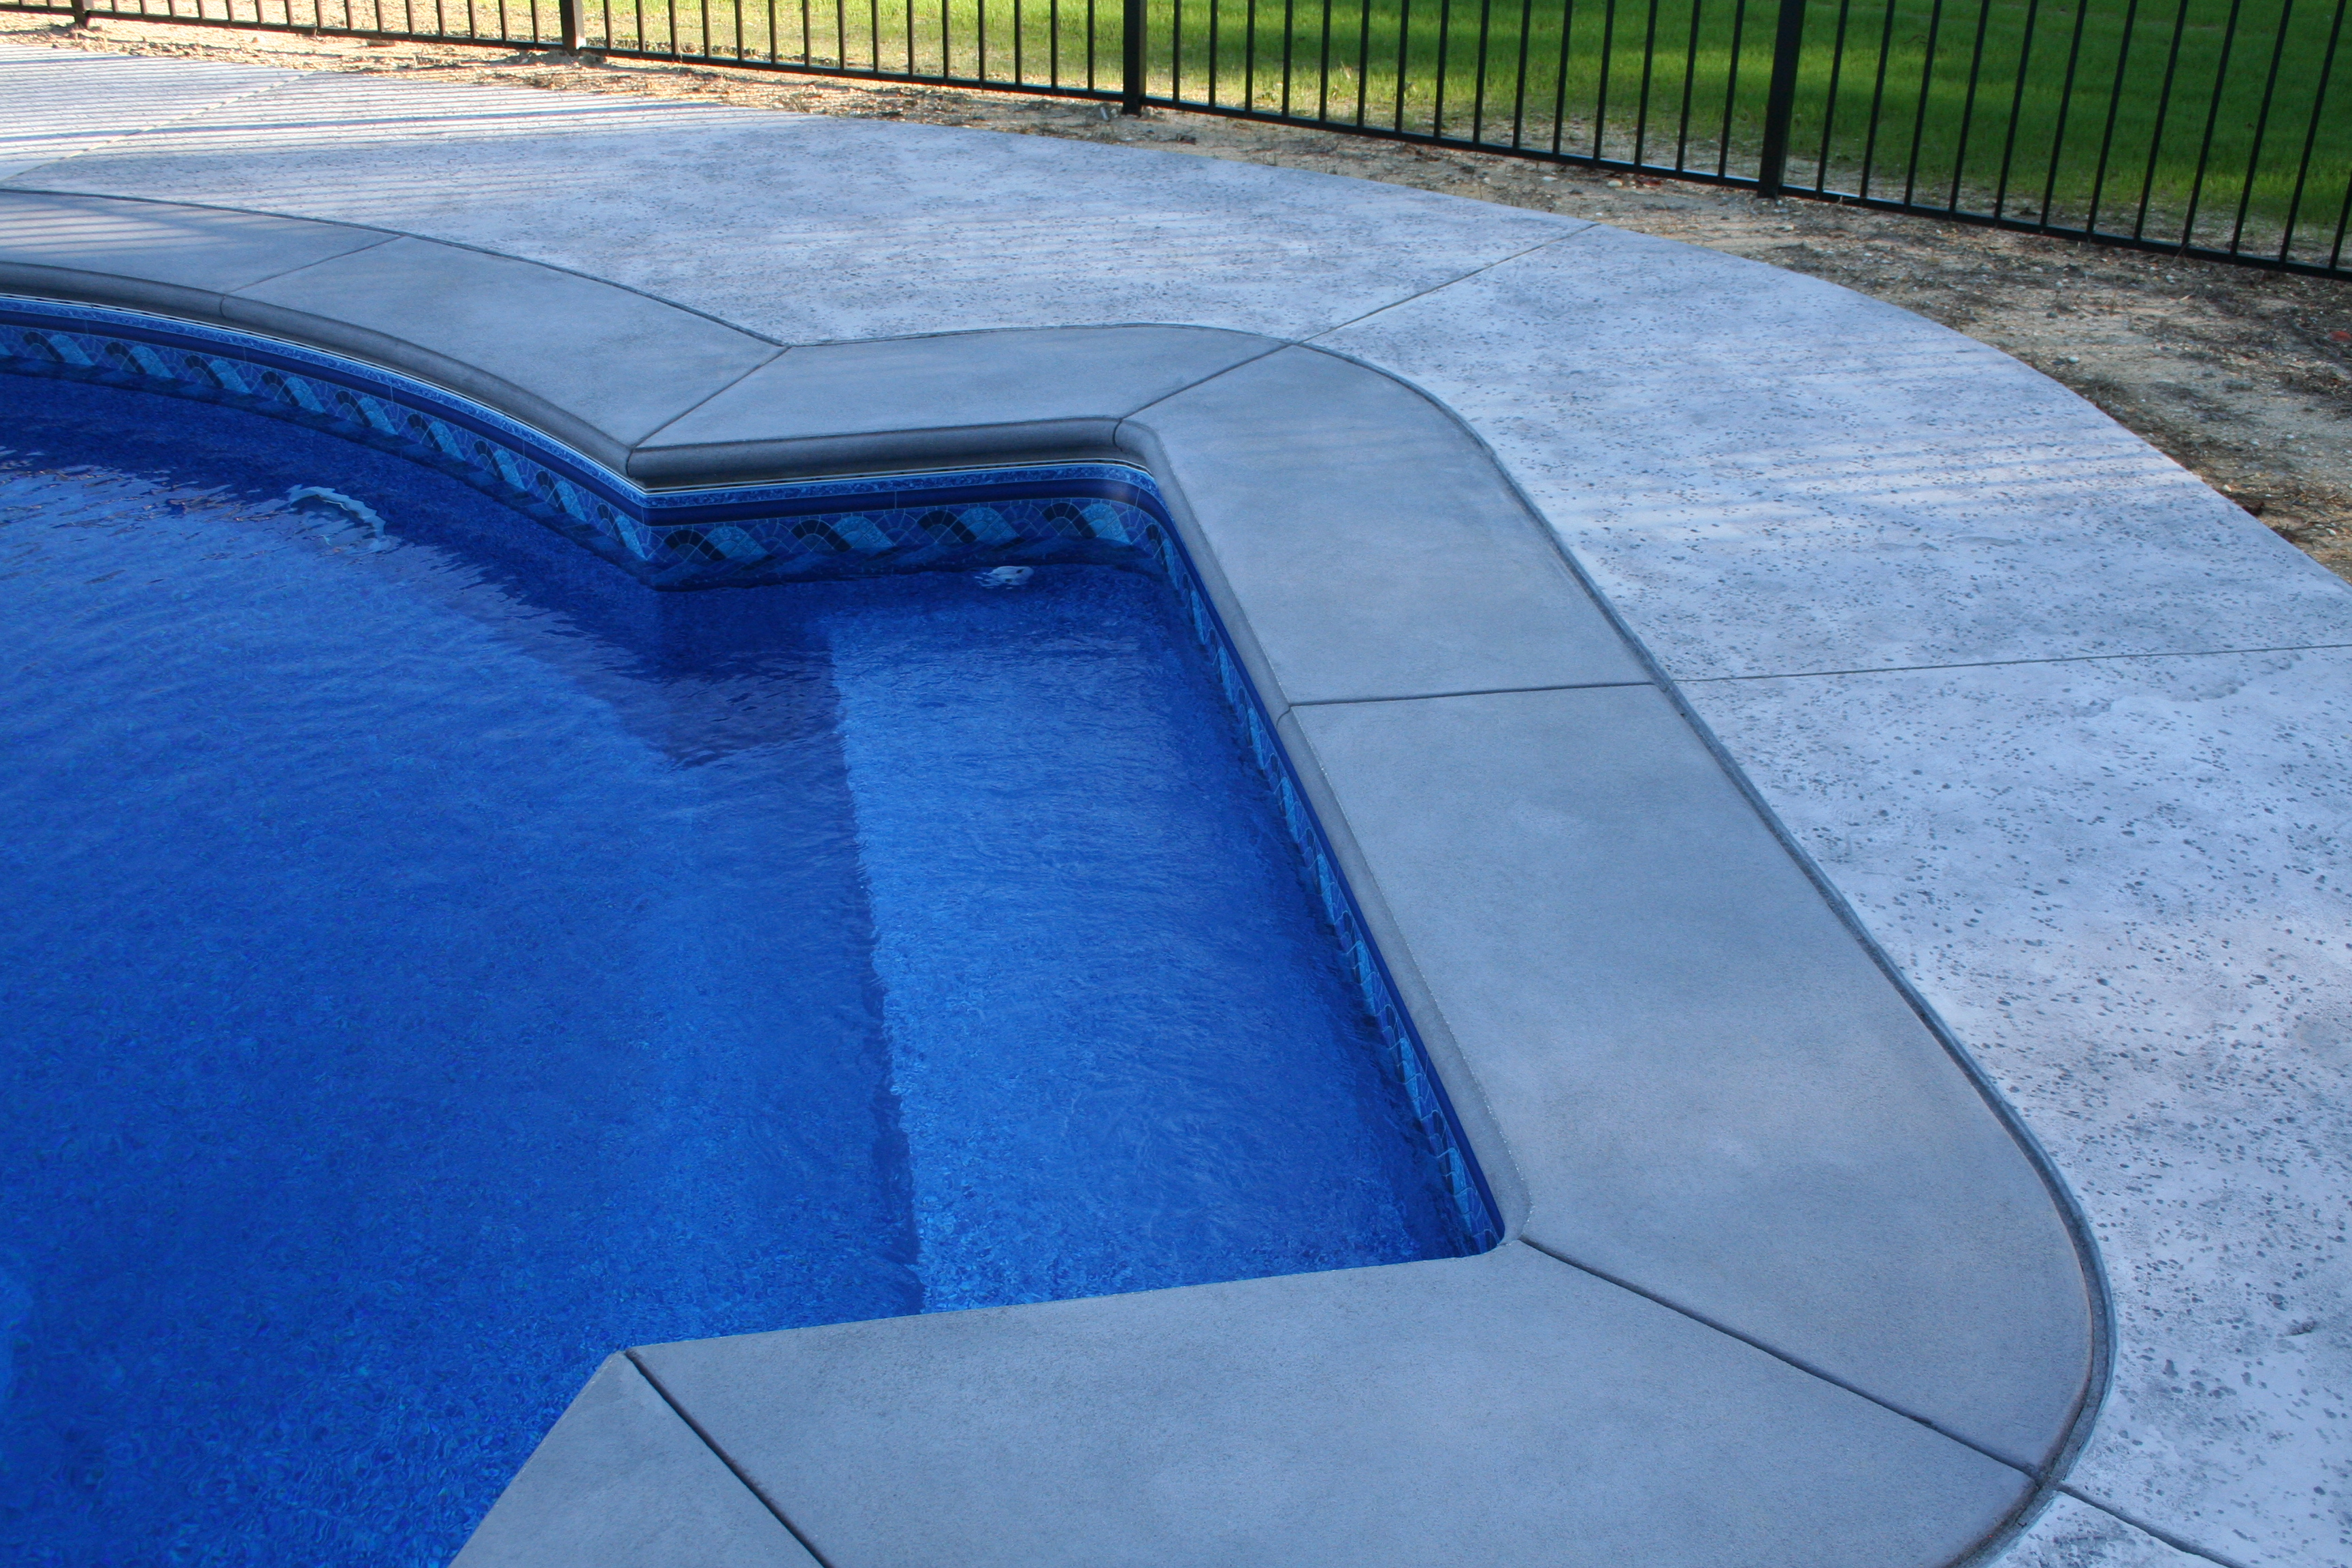 Concrete Pool Patio